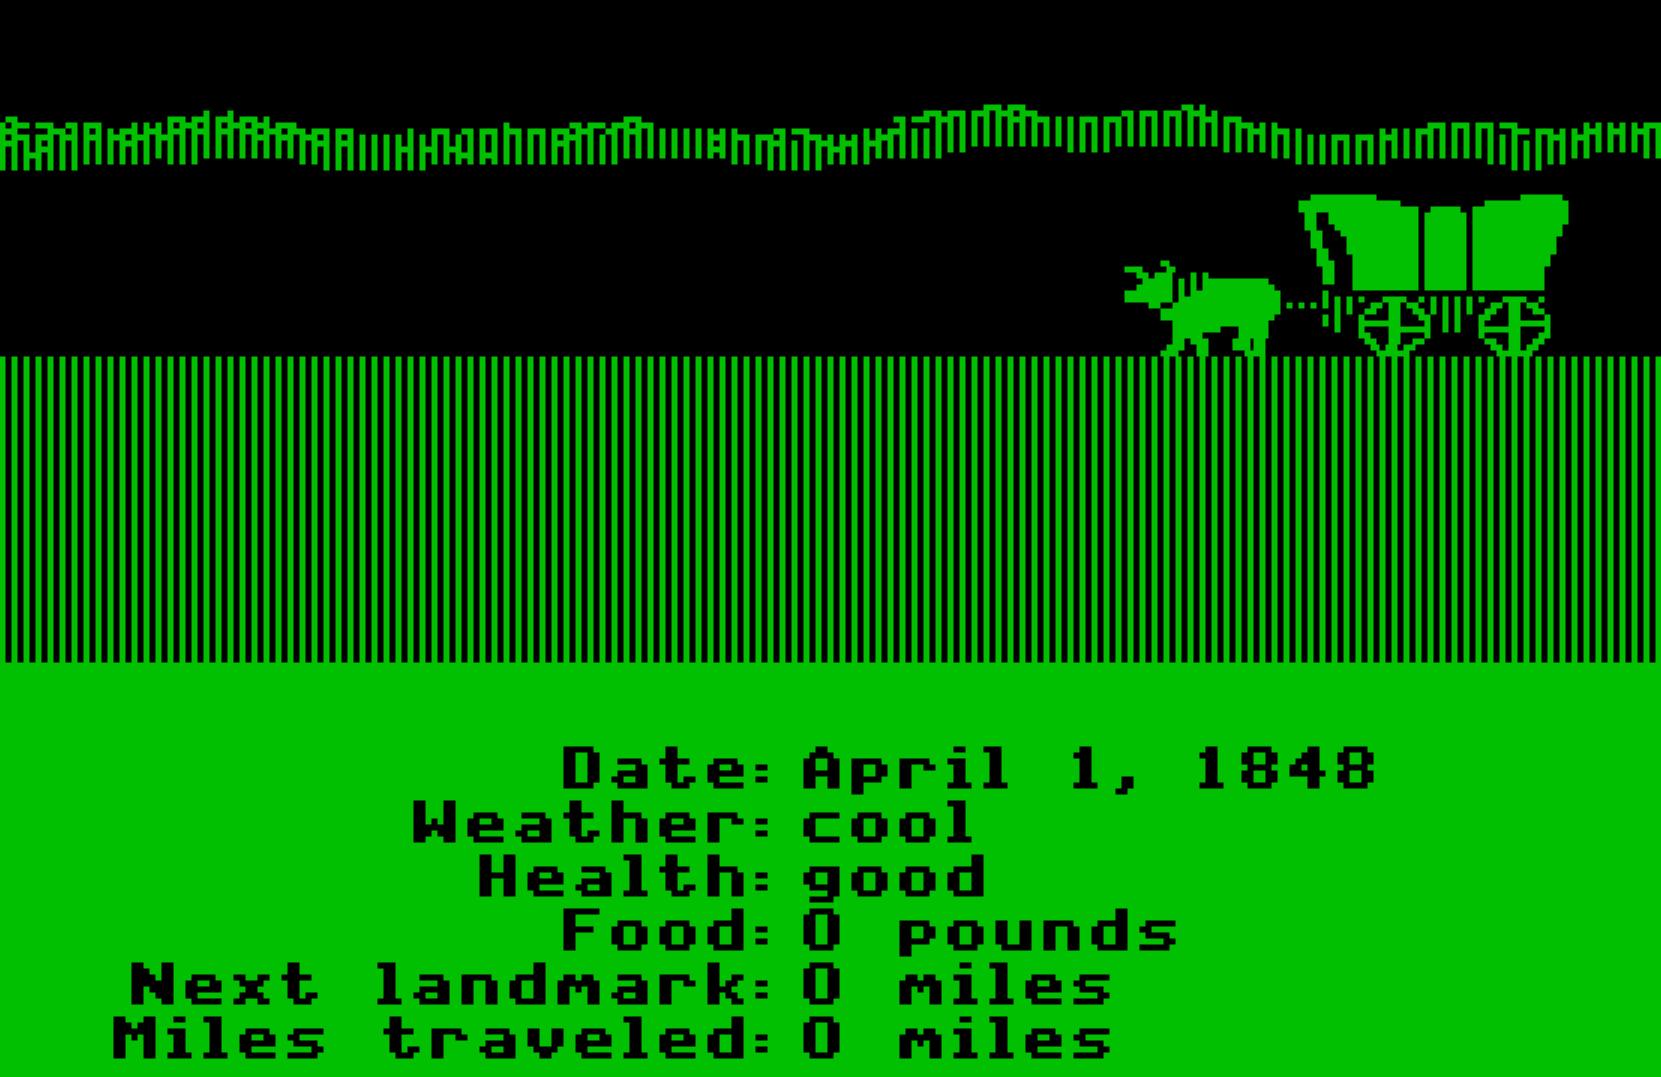 Monochrome (green) screen shot from the original Oregon Trail forthe Apple II c computer.